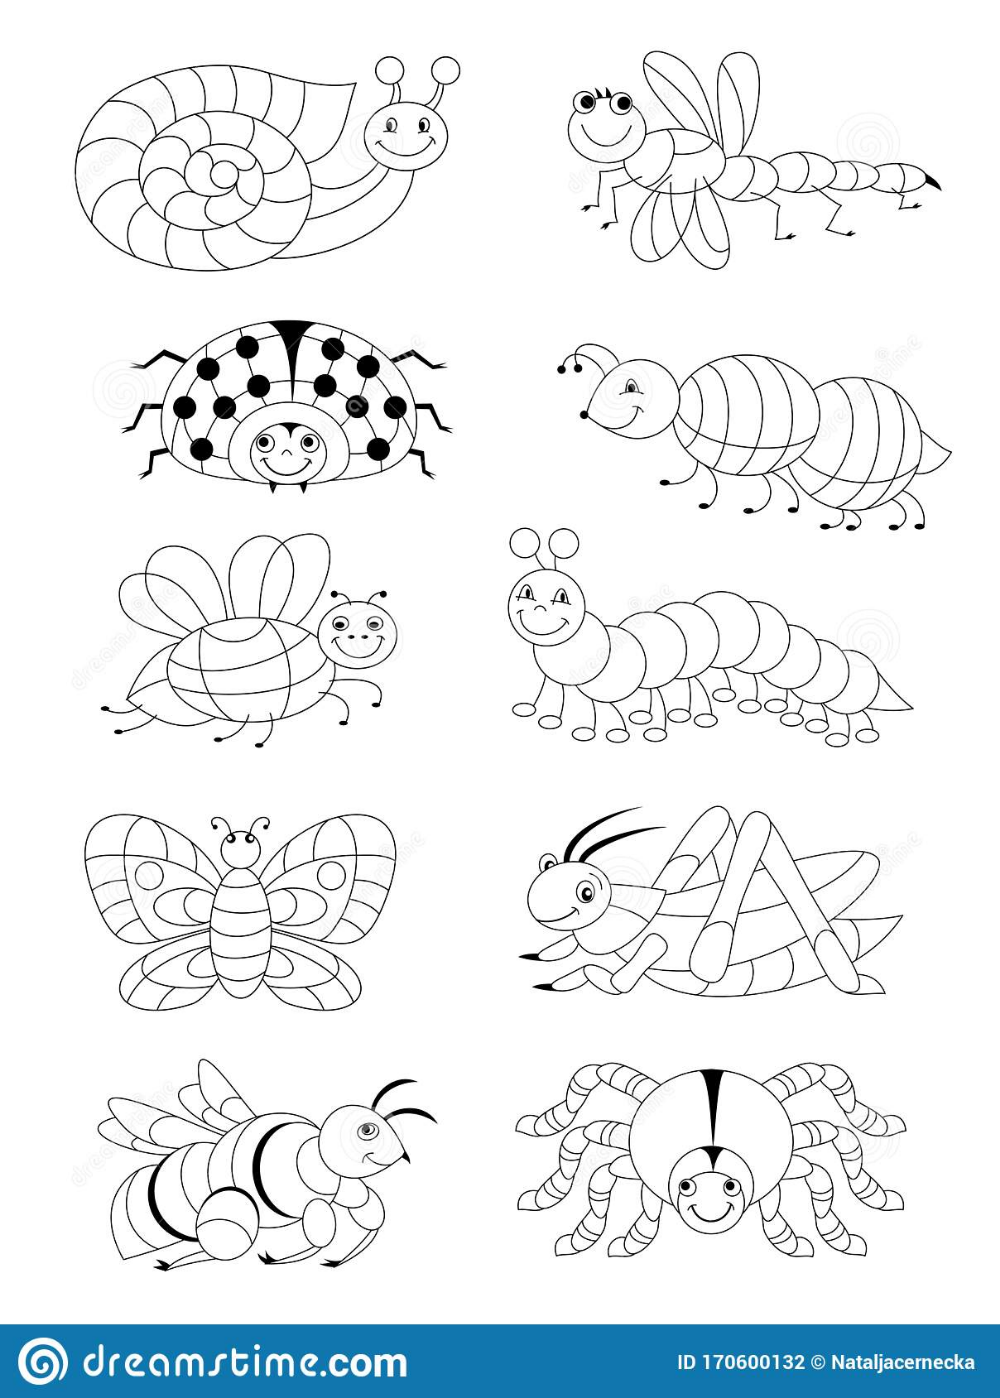 Pin By Daniela Vasile On Spring Season Coloring Books Coloring Book Set Template Printable [ 1398 x 1000 Pixel ]